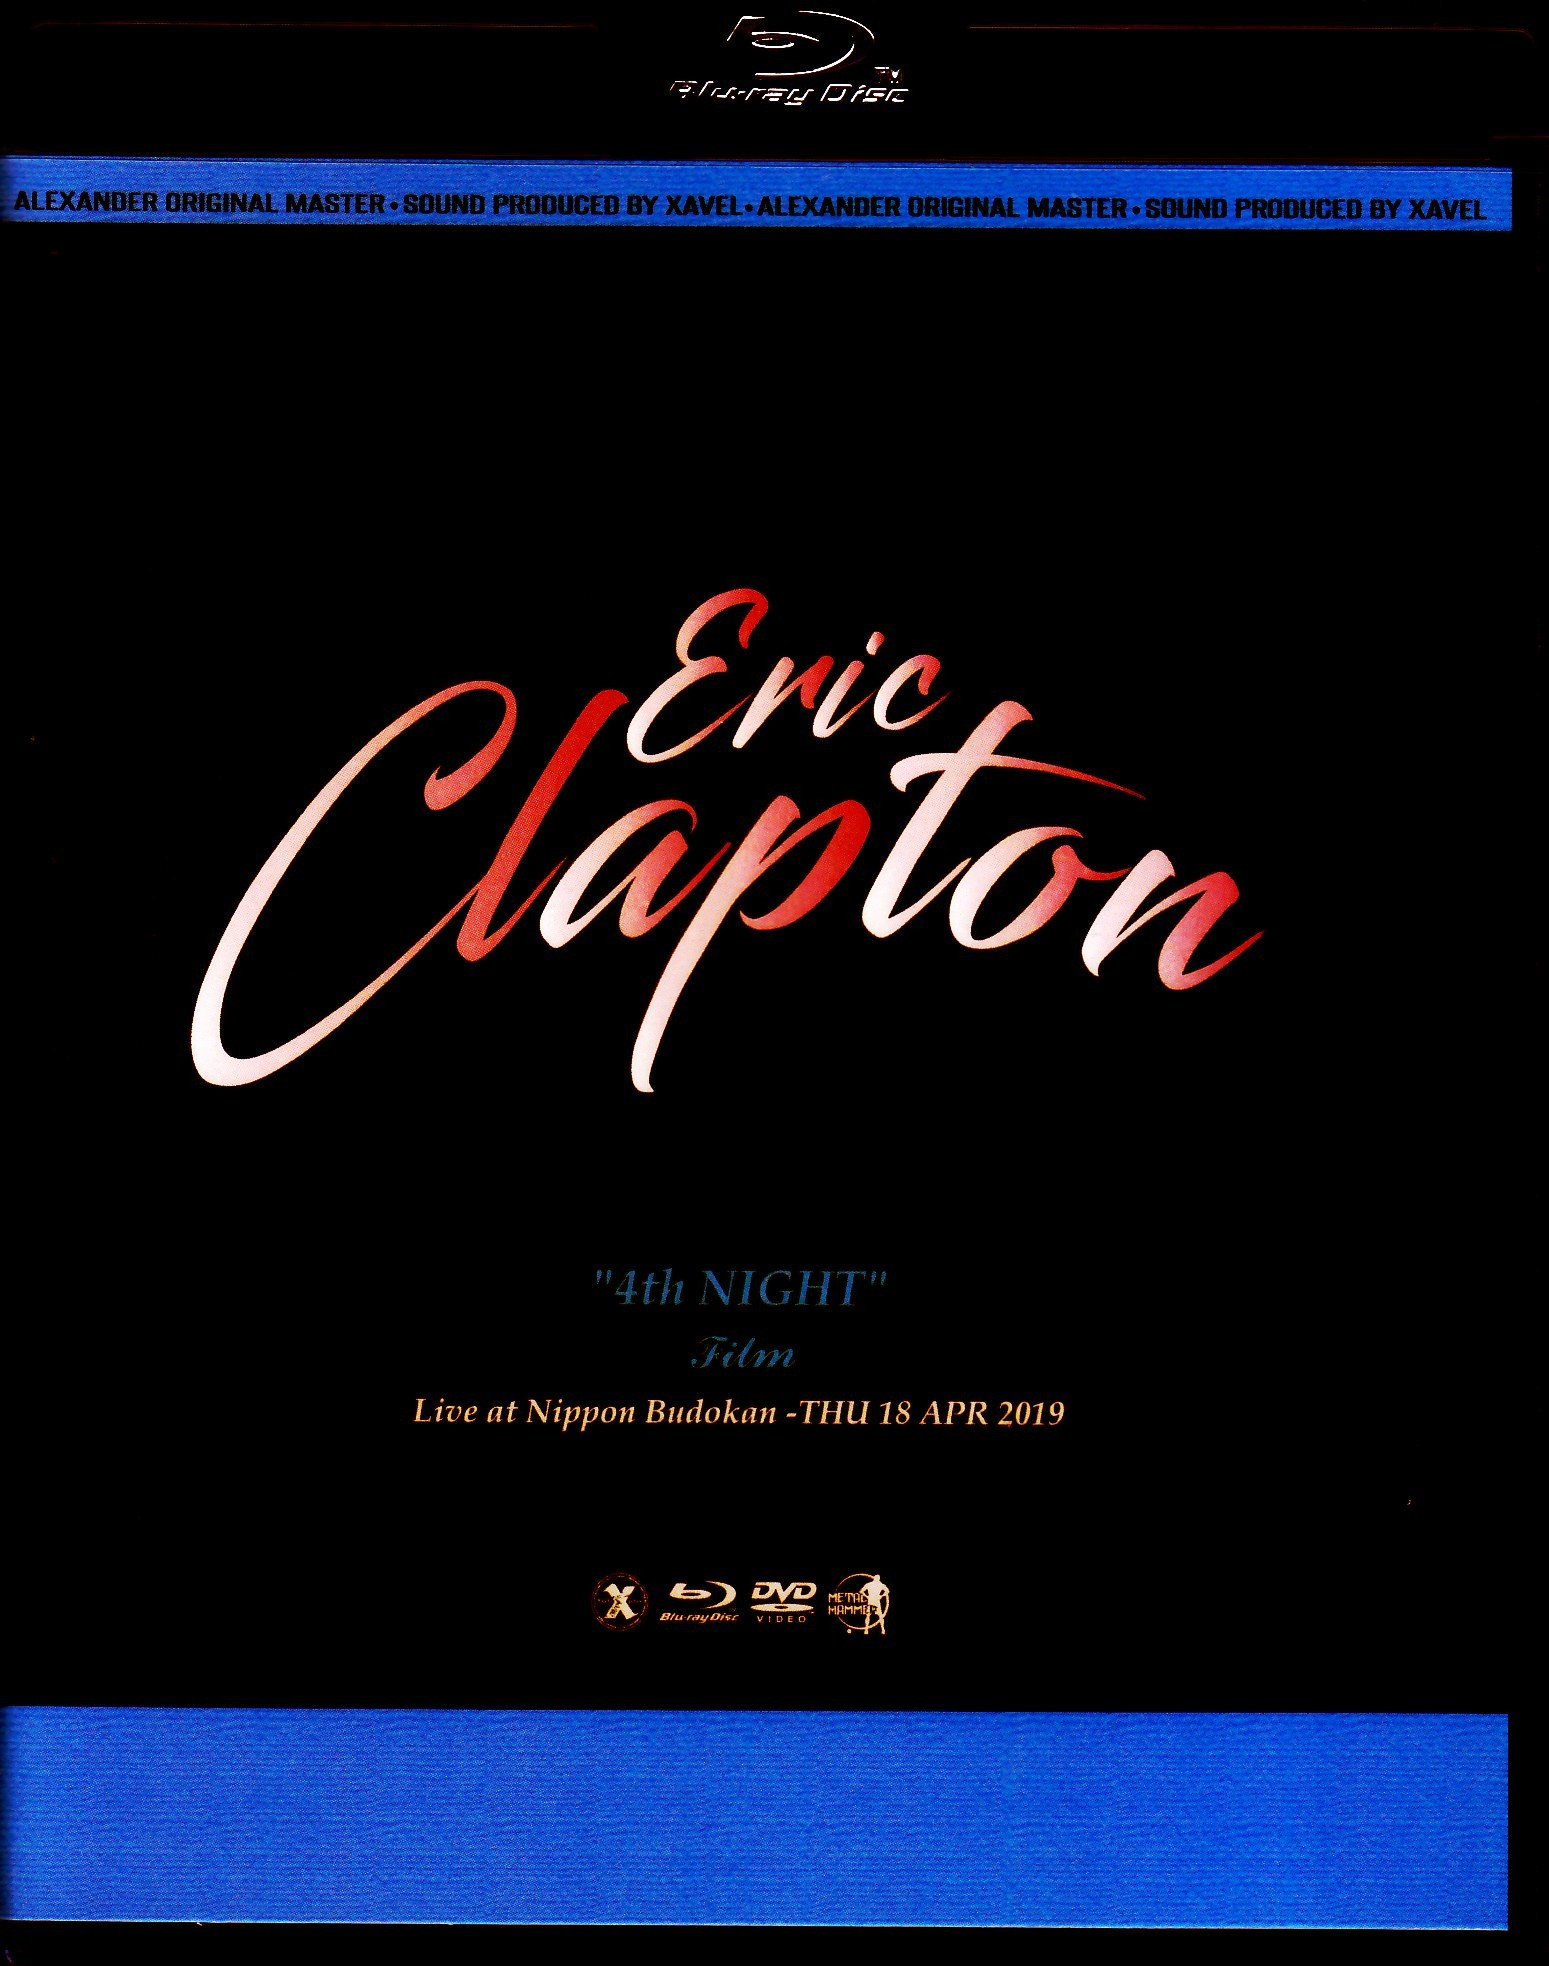 Eric Clapton エリック・クラプトン/Tokyo,Japan 4.18.2019 Blu-Ray & DVD Ver